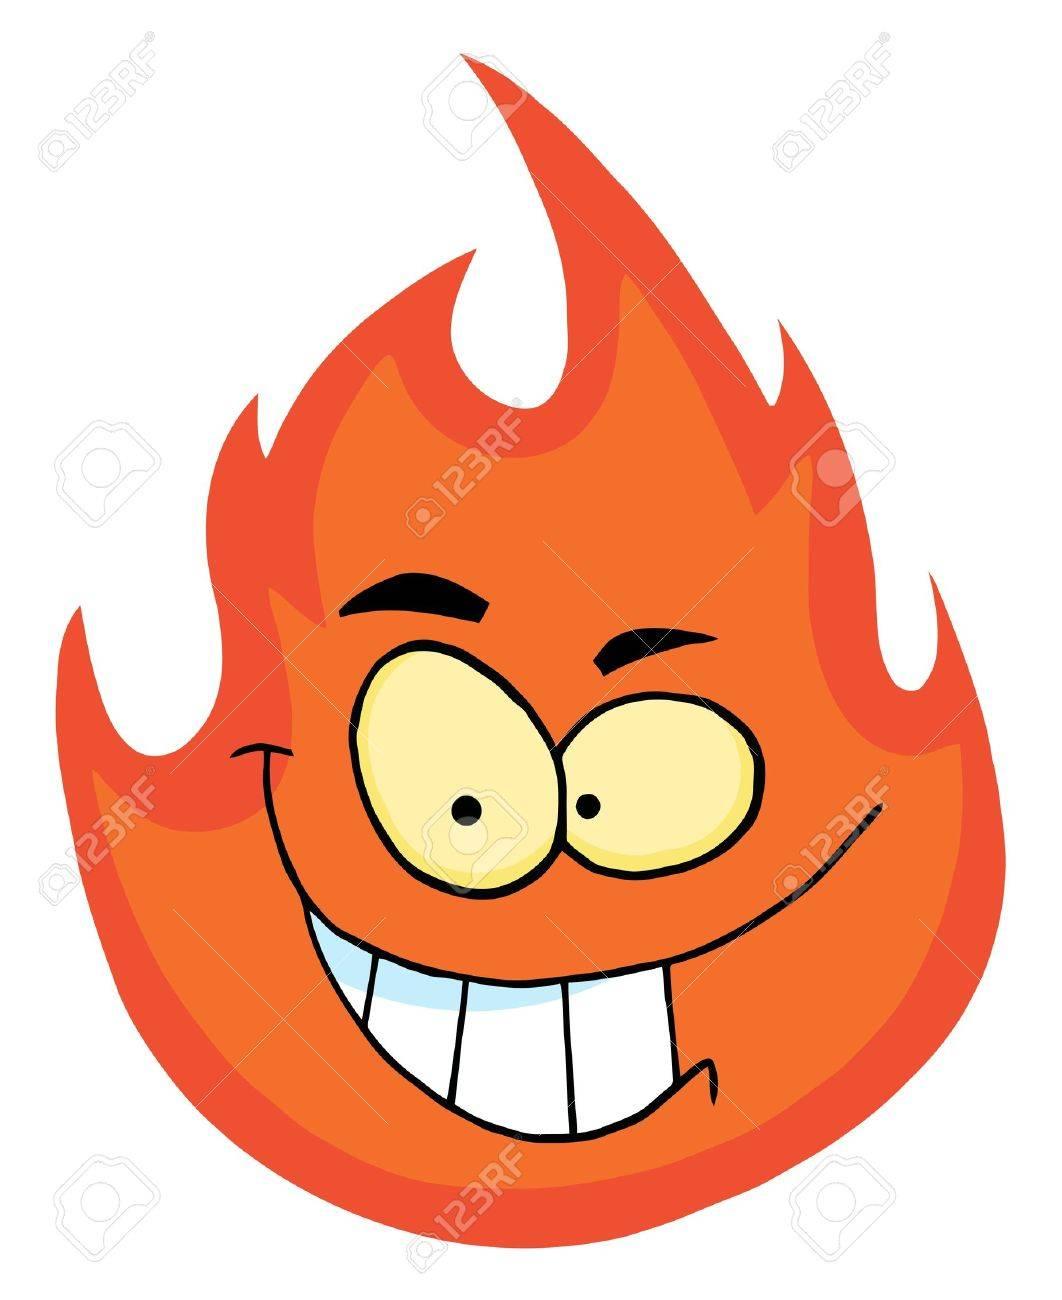 1062x1300 Fire Cartoon Stock Photos Amp Pictures. Royalty Free Fire Cartoon